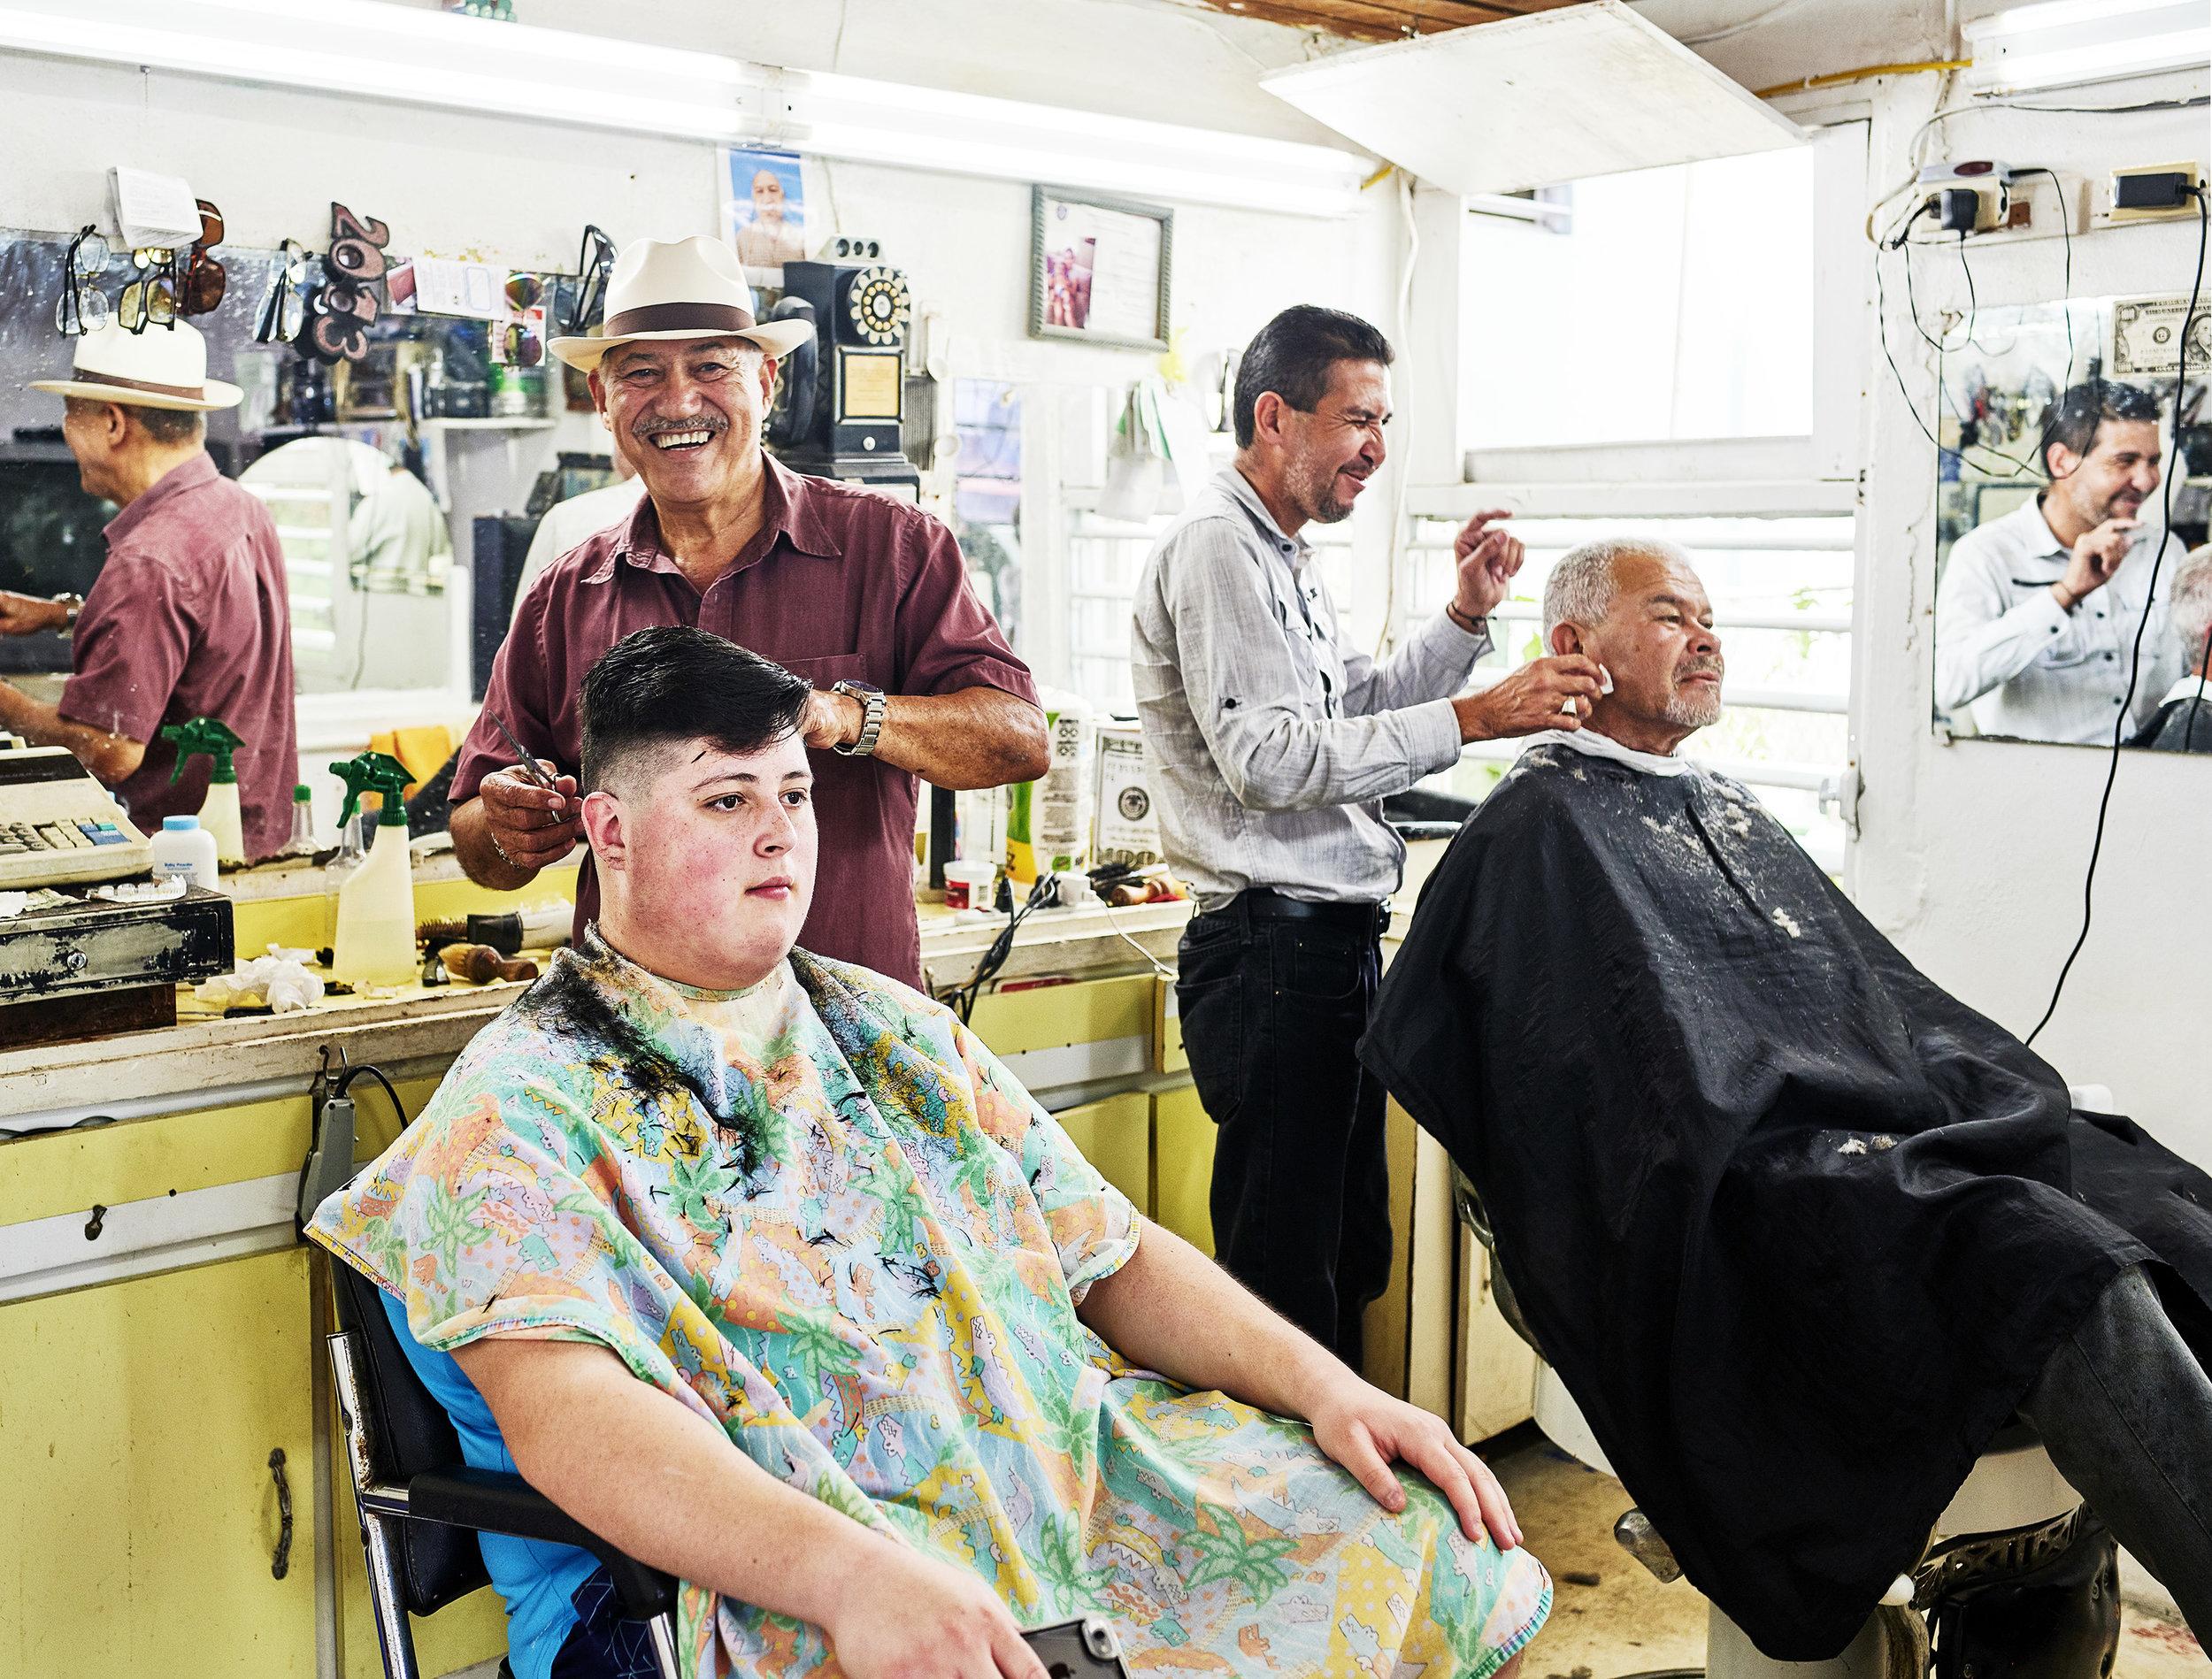 08-Barber Shop.jpg